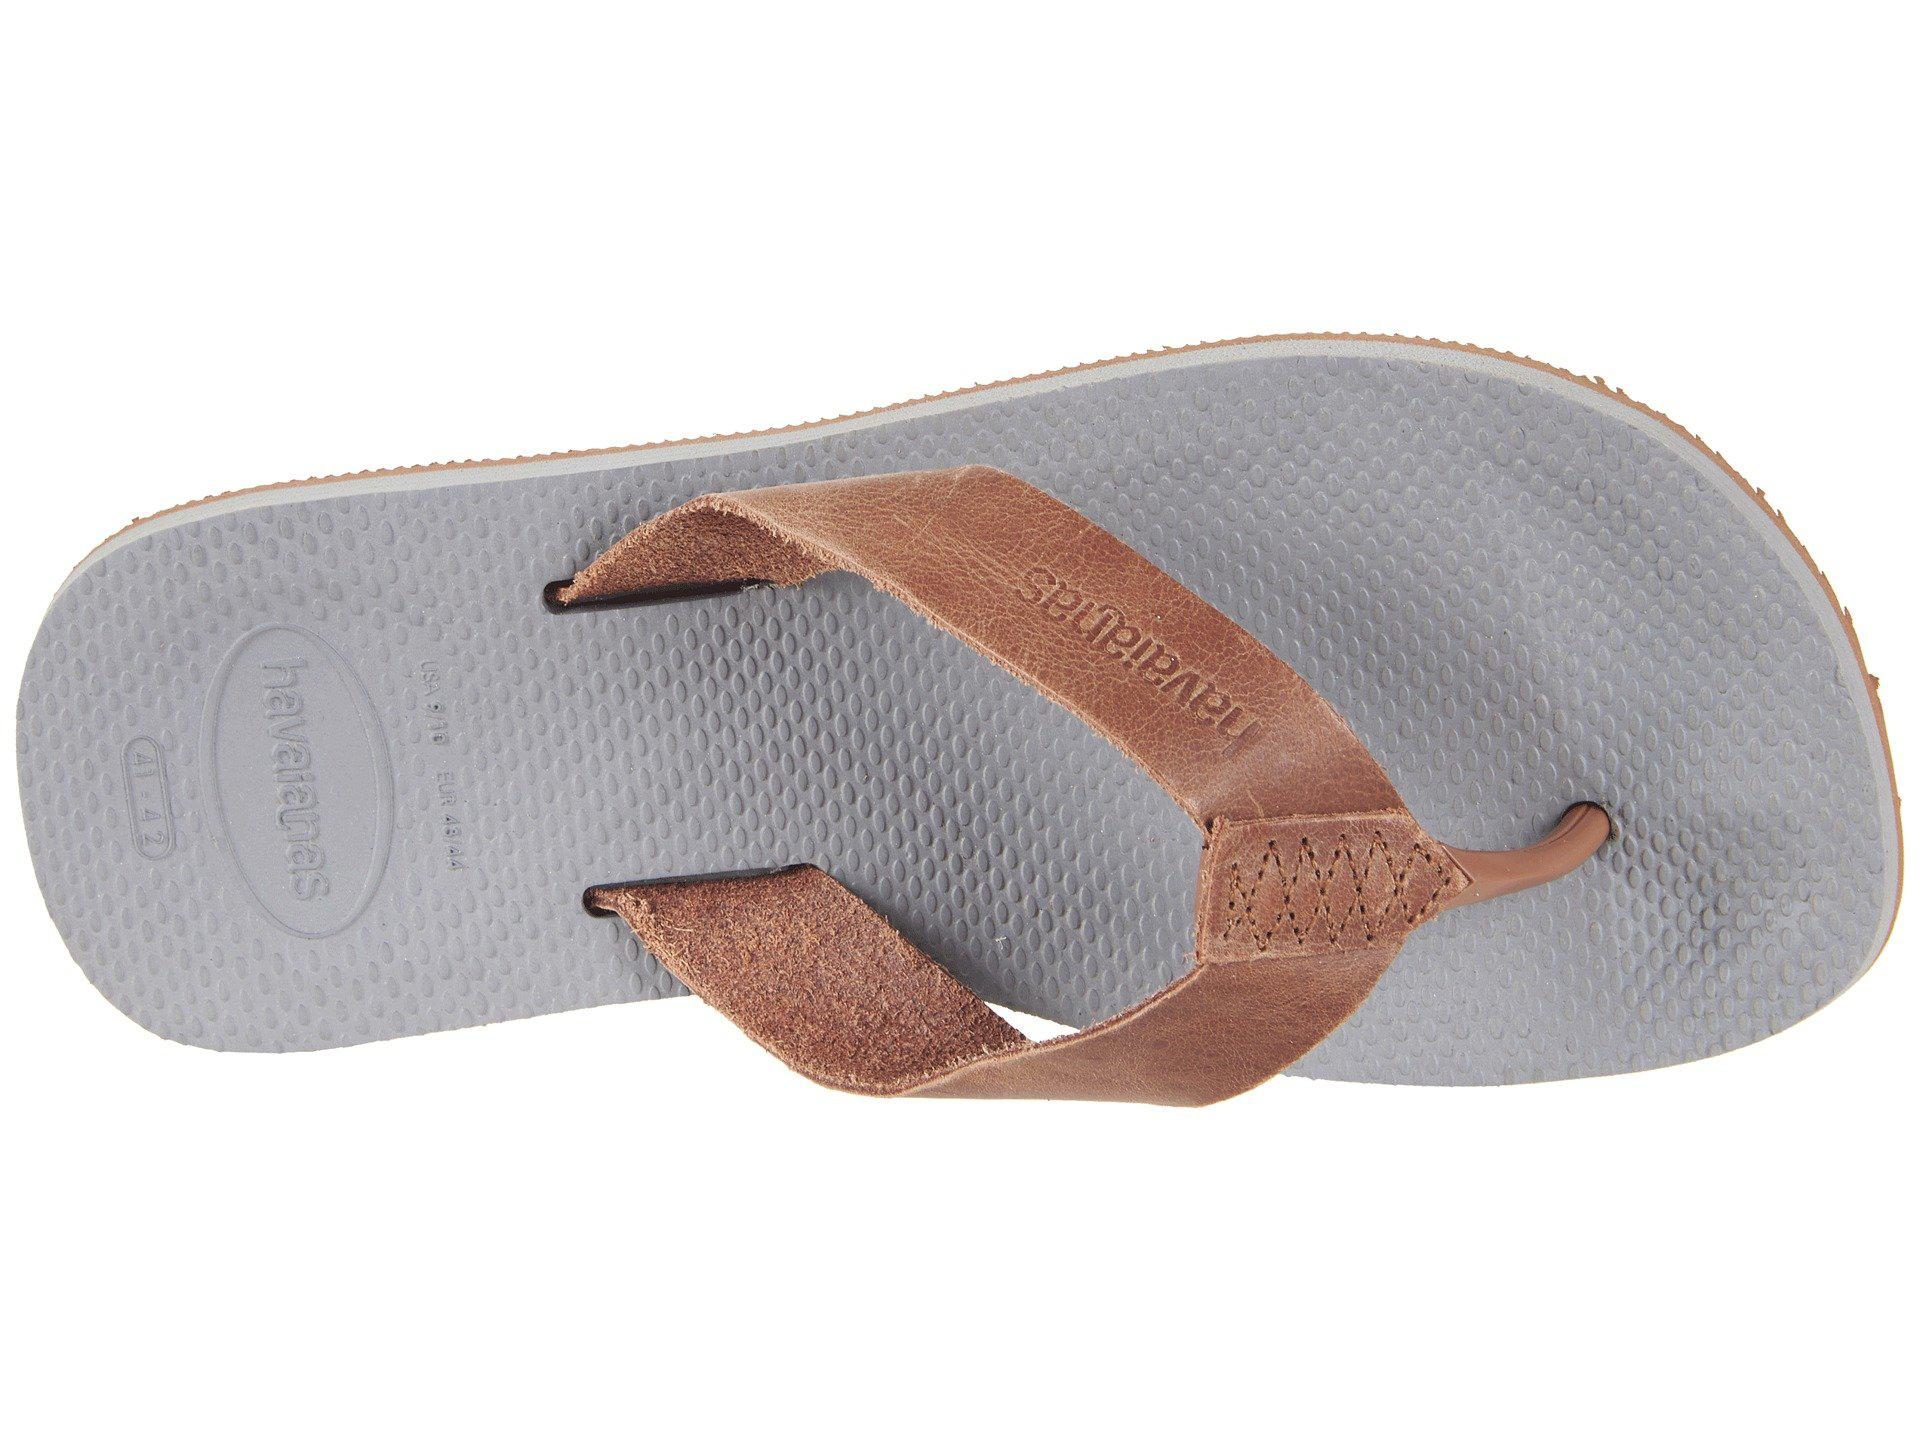 475728fac3d9 Havaianas - Gray Urban Special Flip-flops (black) Men s Sandals for Men -.  View fullscreen